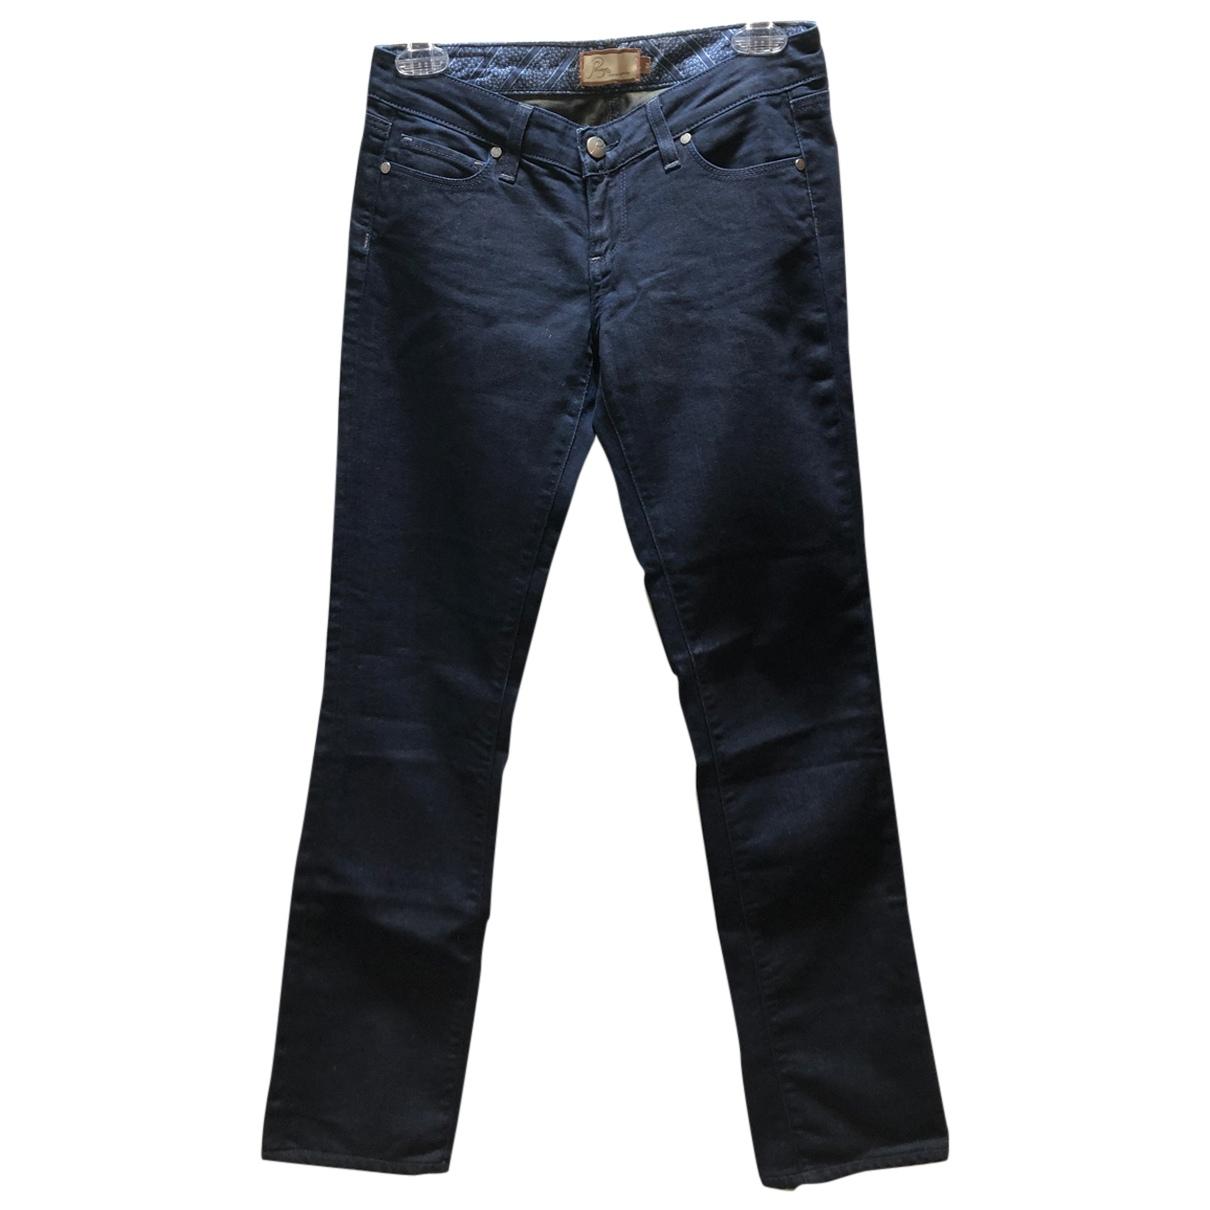 Vaquero recto Paige Jeans